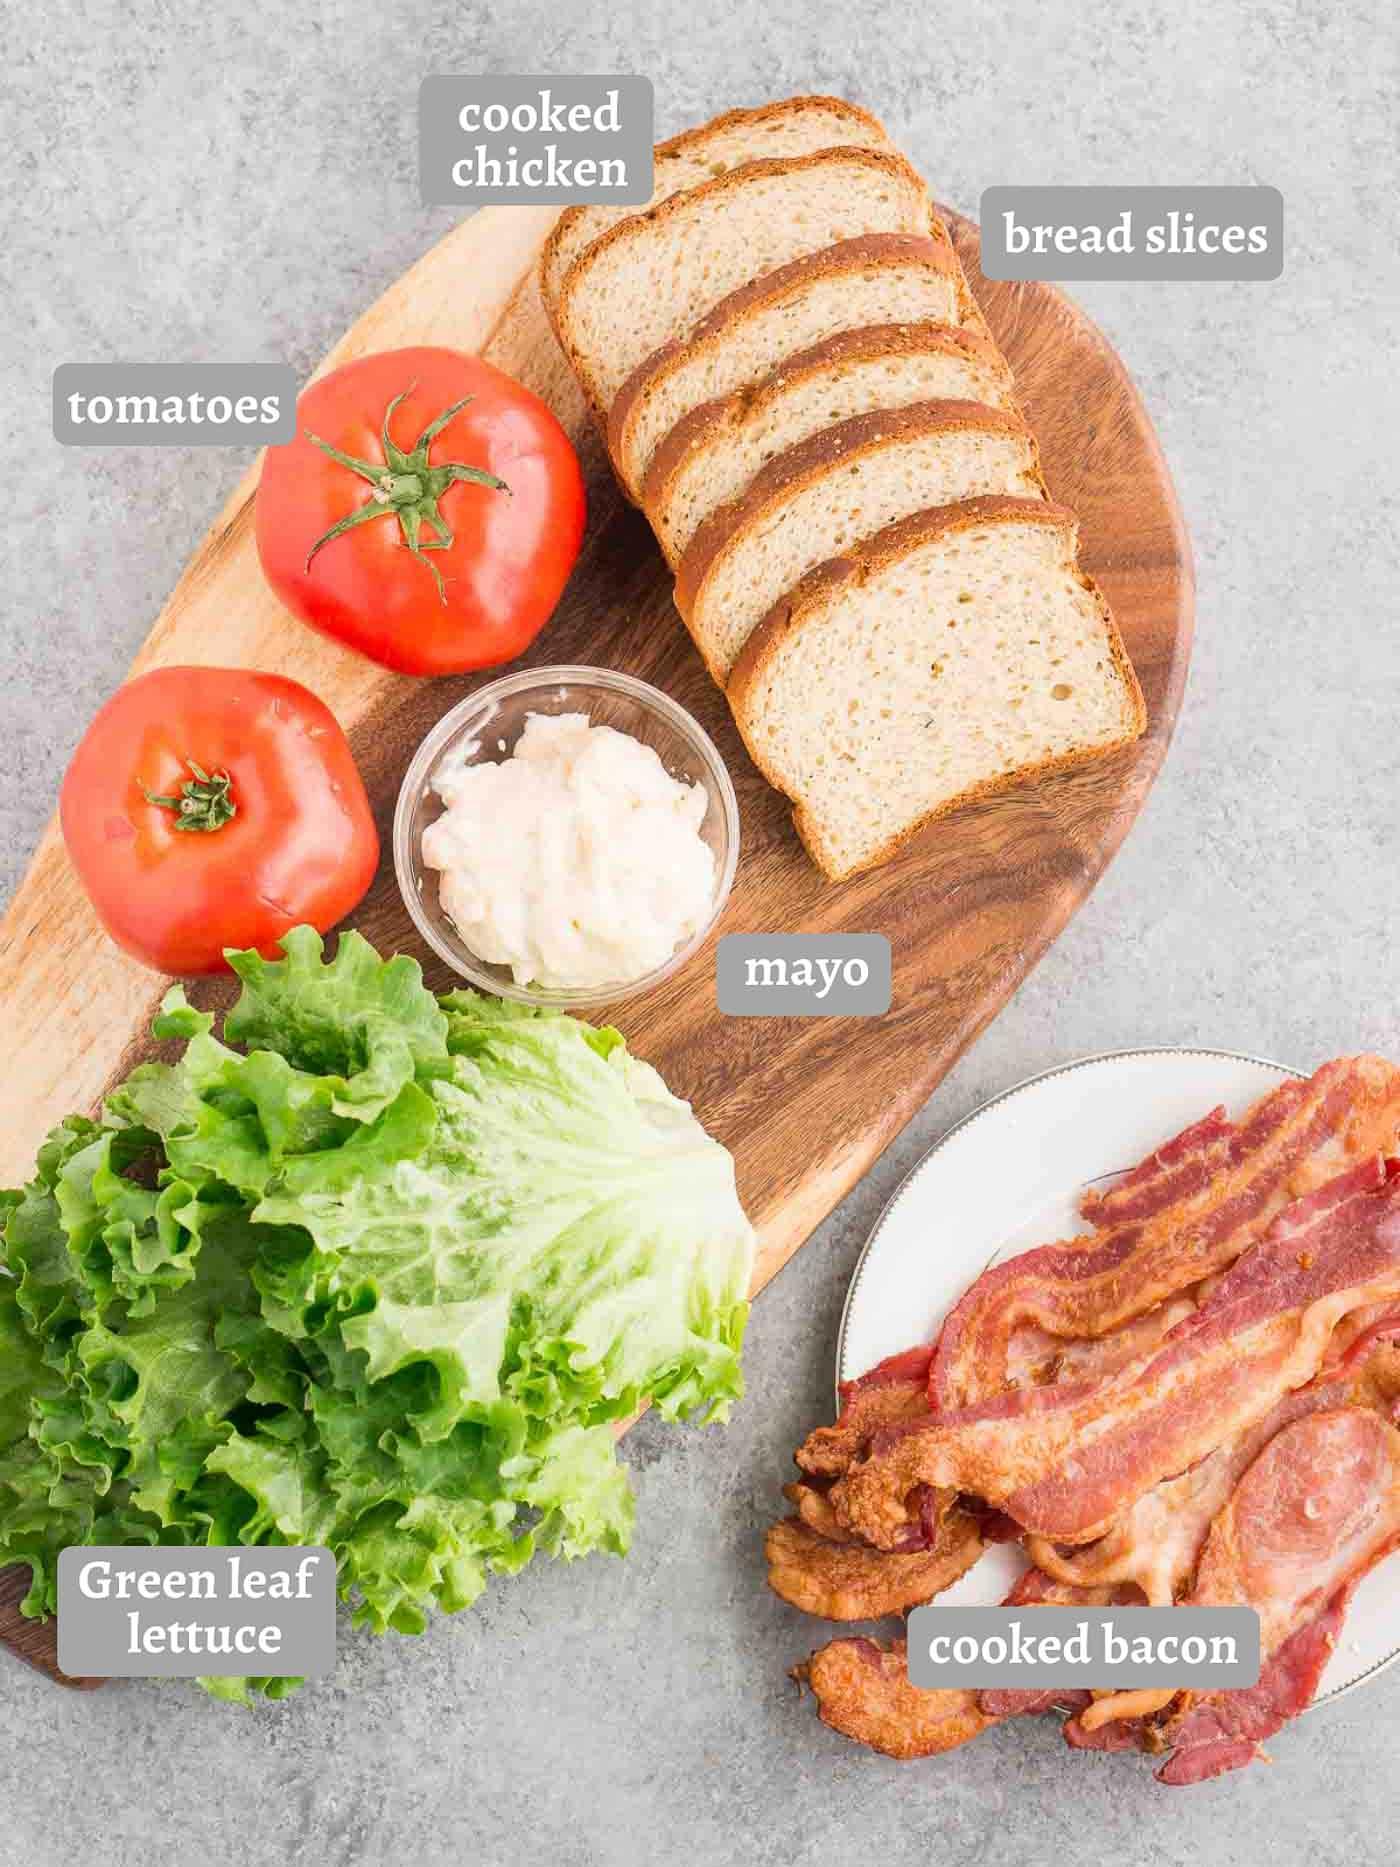 ingredients for BLT sandwich